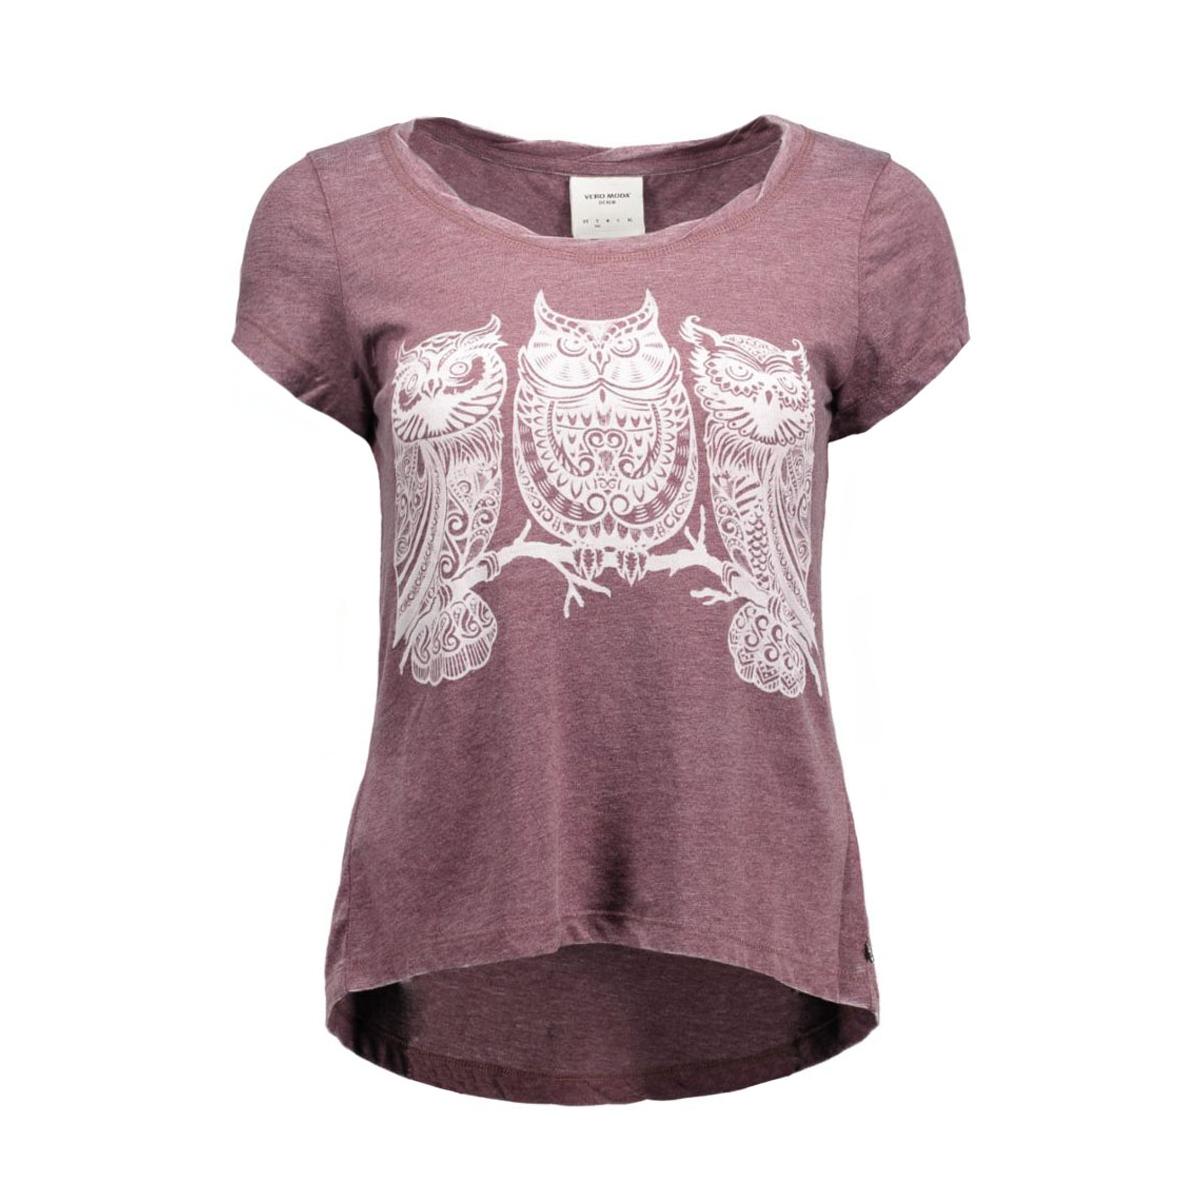 vmmoog molly animal ss top box dnm 10162155 vero moda t-shirt decadent choco/melange w